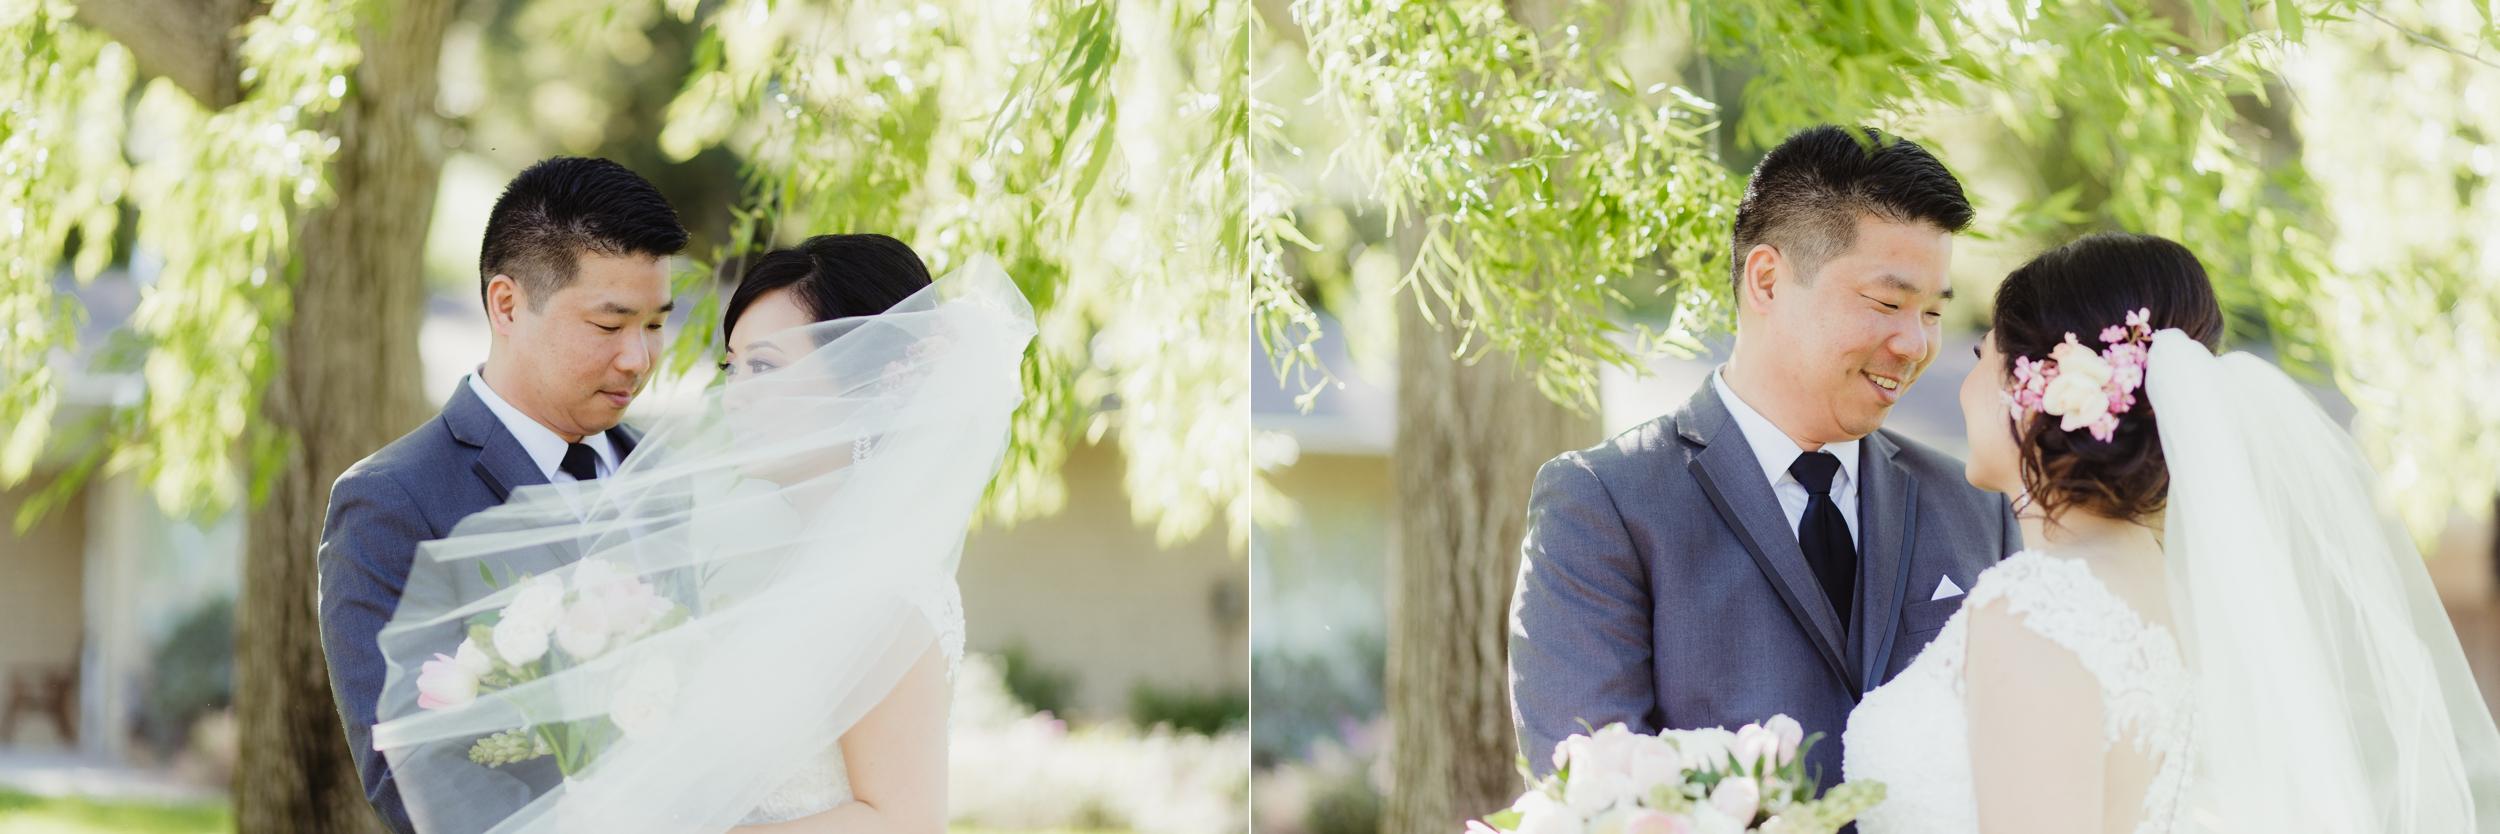 23-saratoga-country-club-wedding-vivianchen-376_WEB.jpg